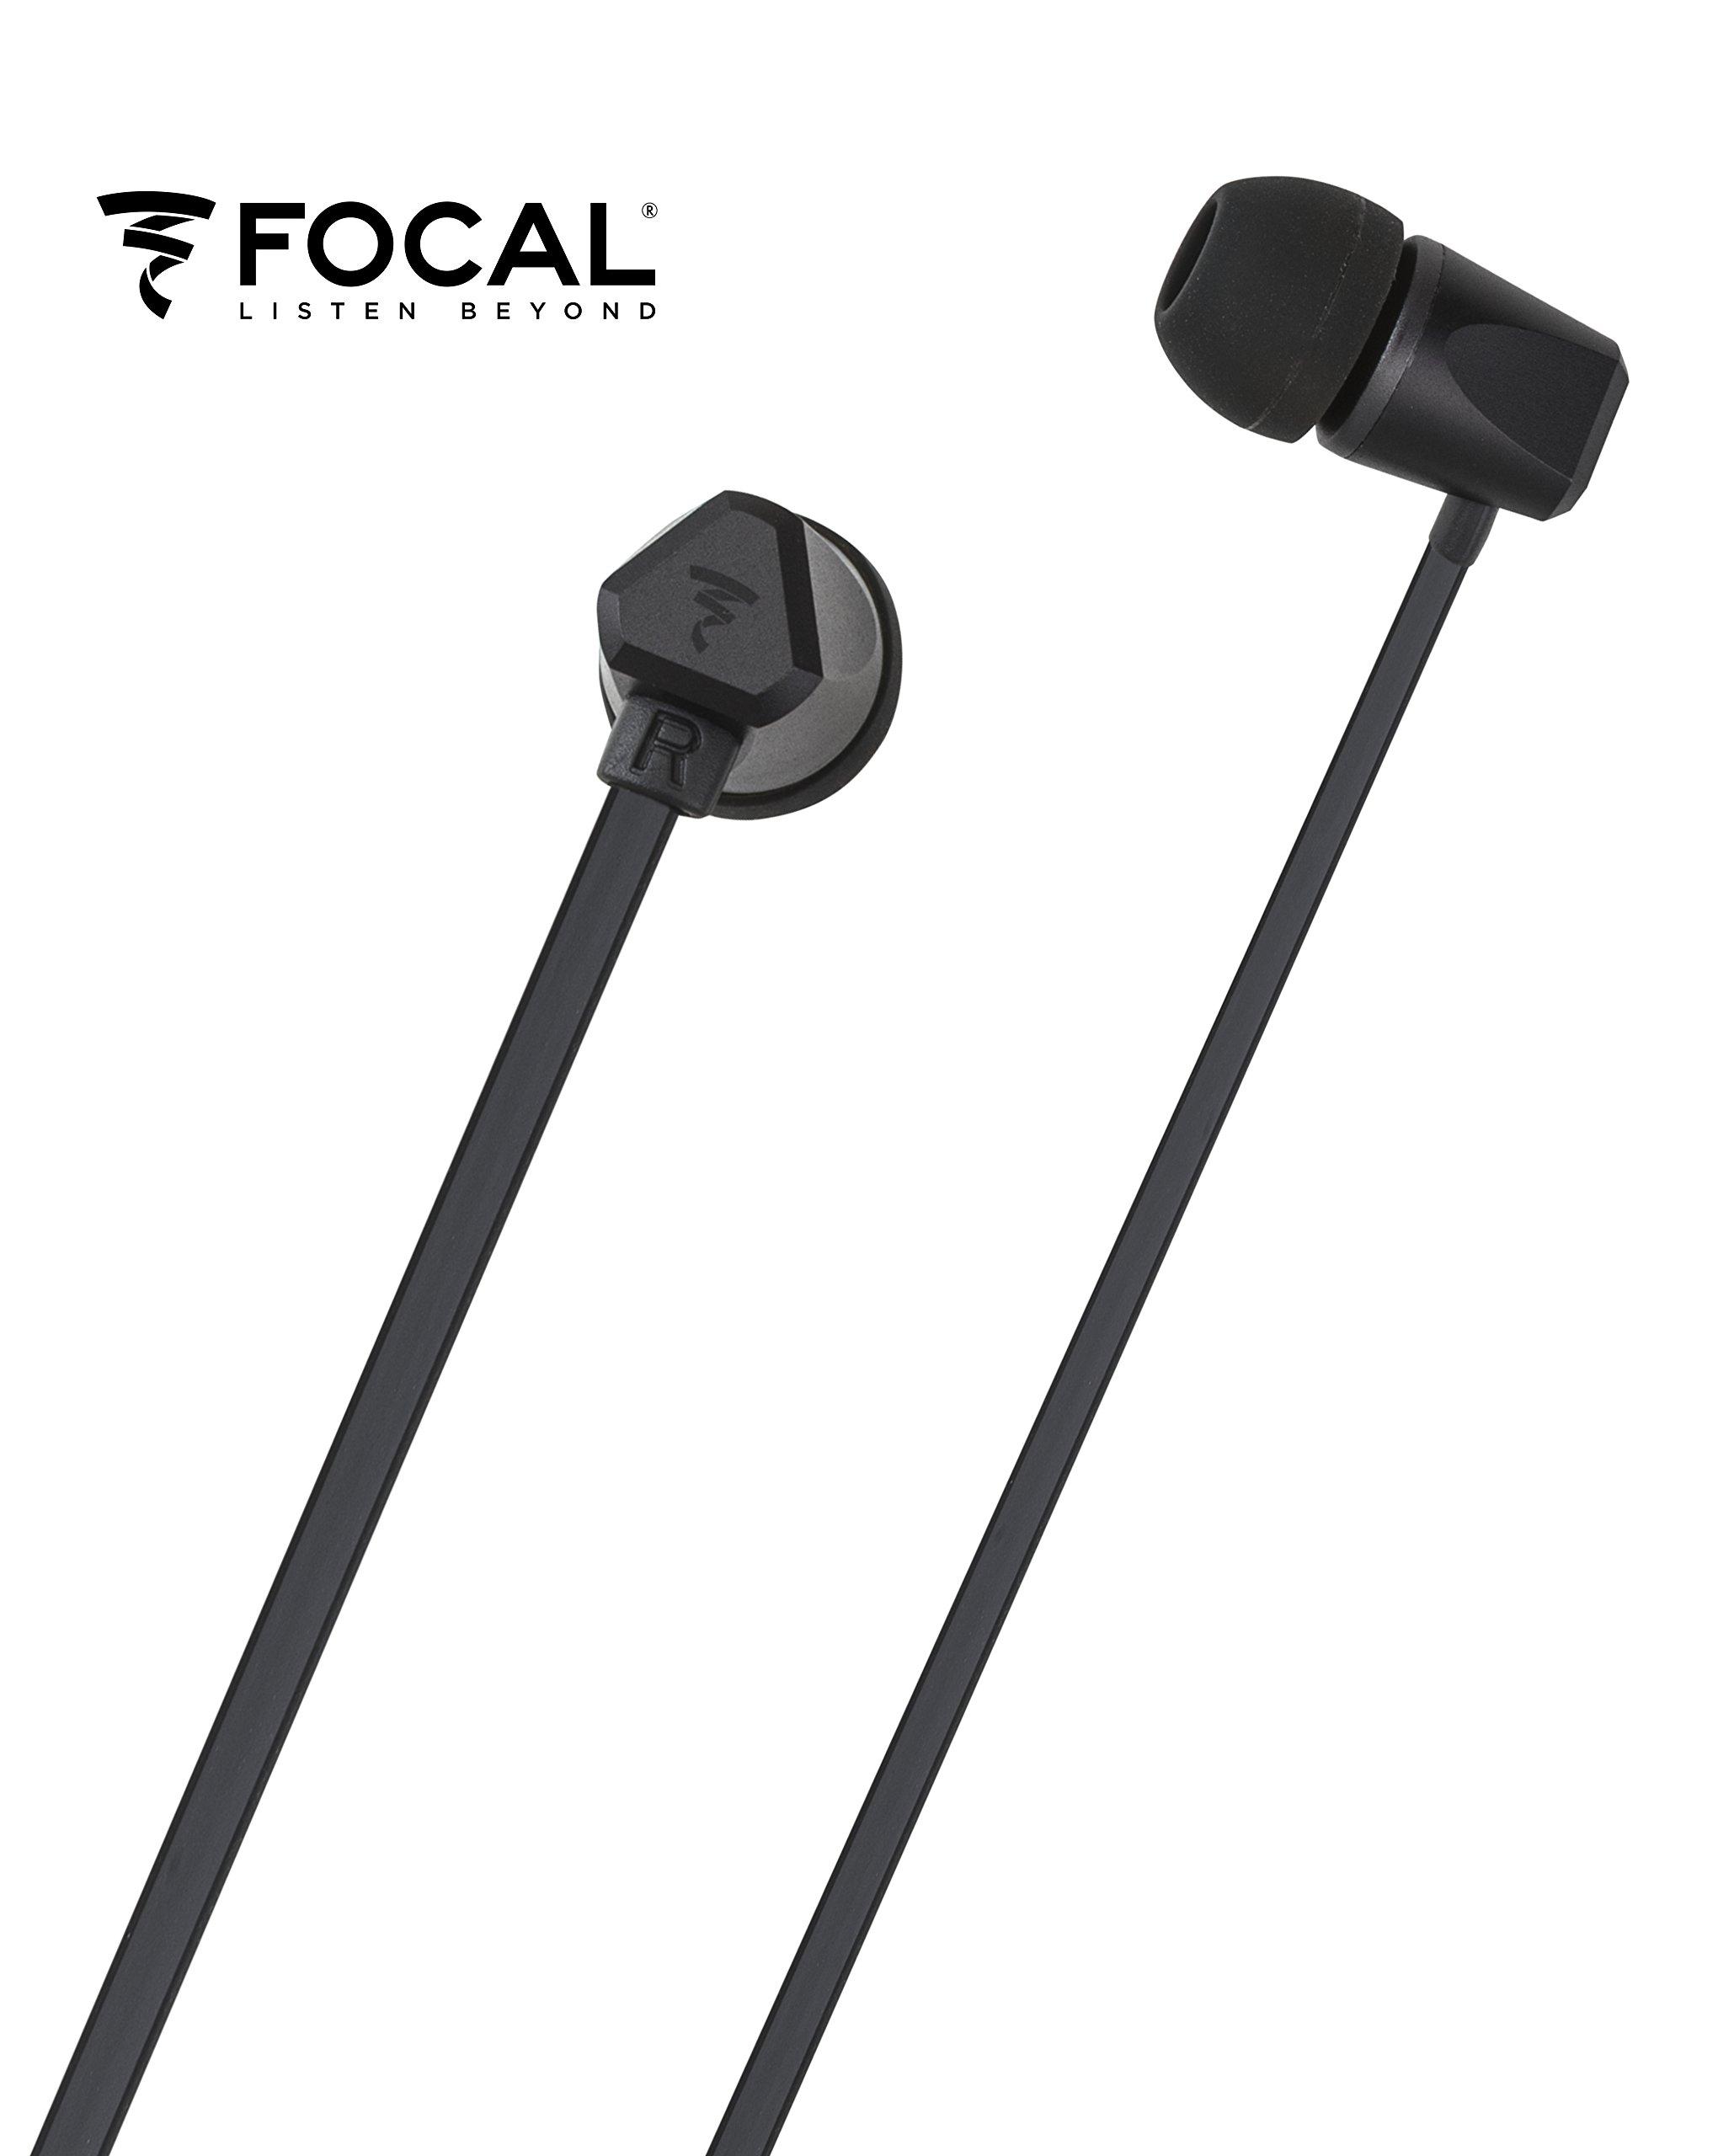 FOCAL Sense INEAR Earphone (Black)